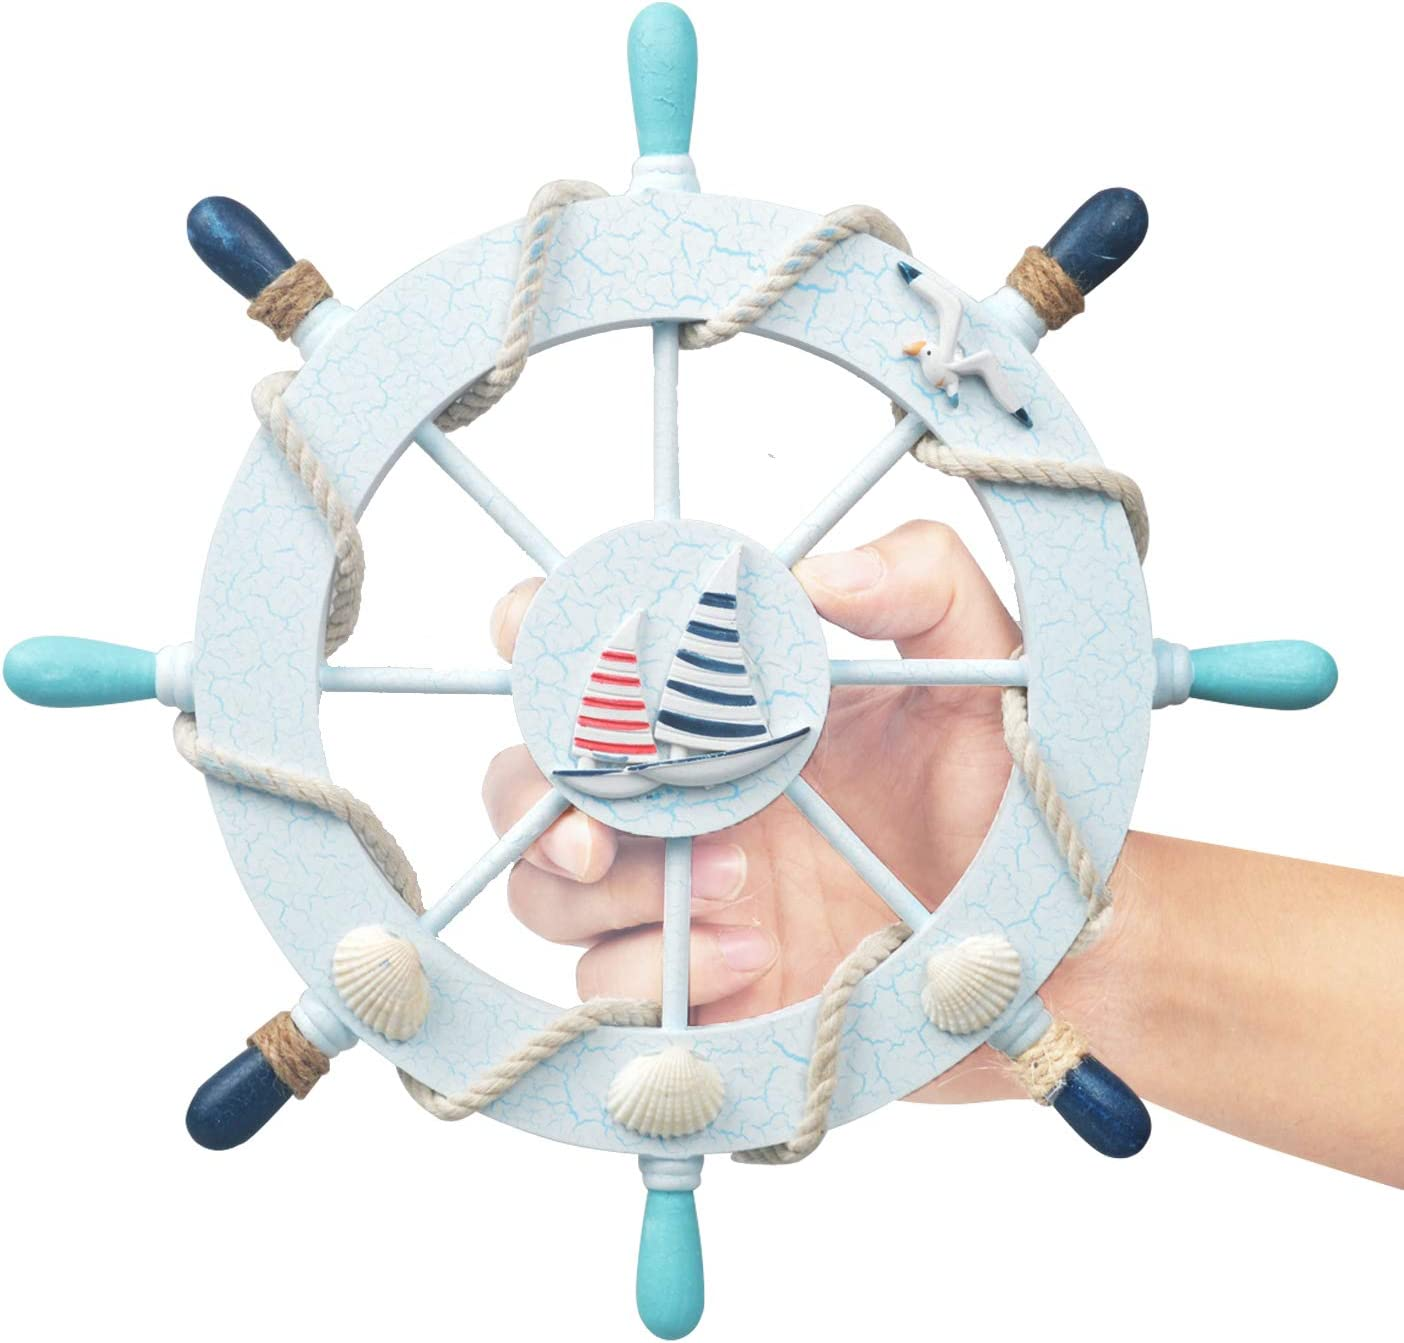 Fangoo 28 CM Wooden Ship Wheel with Rope Nautical Wooden Boat Ship Steering Wheel Rudder Wall Decor Door Hanging Ornament 4